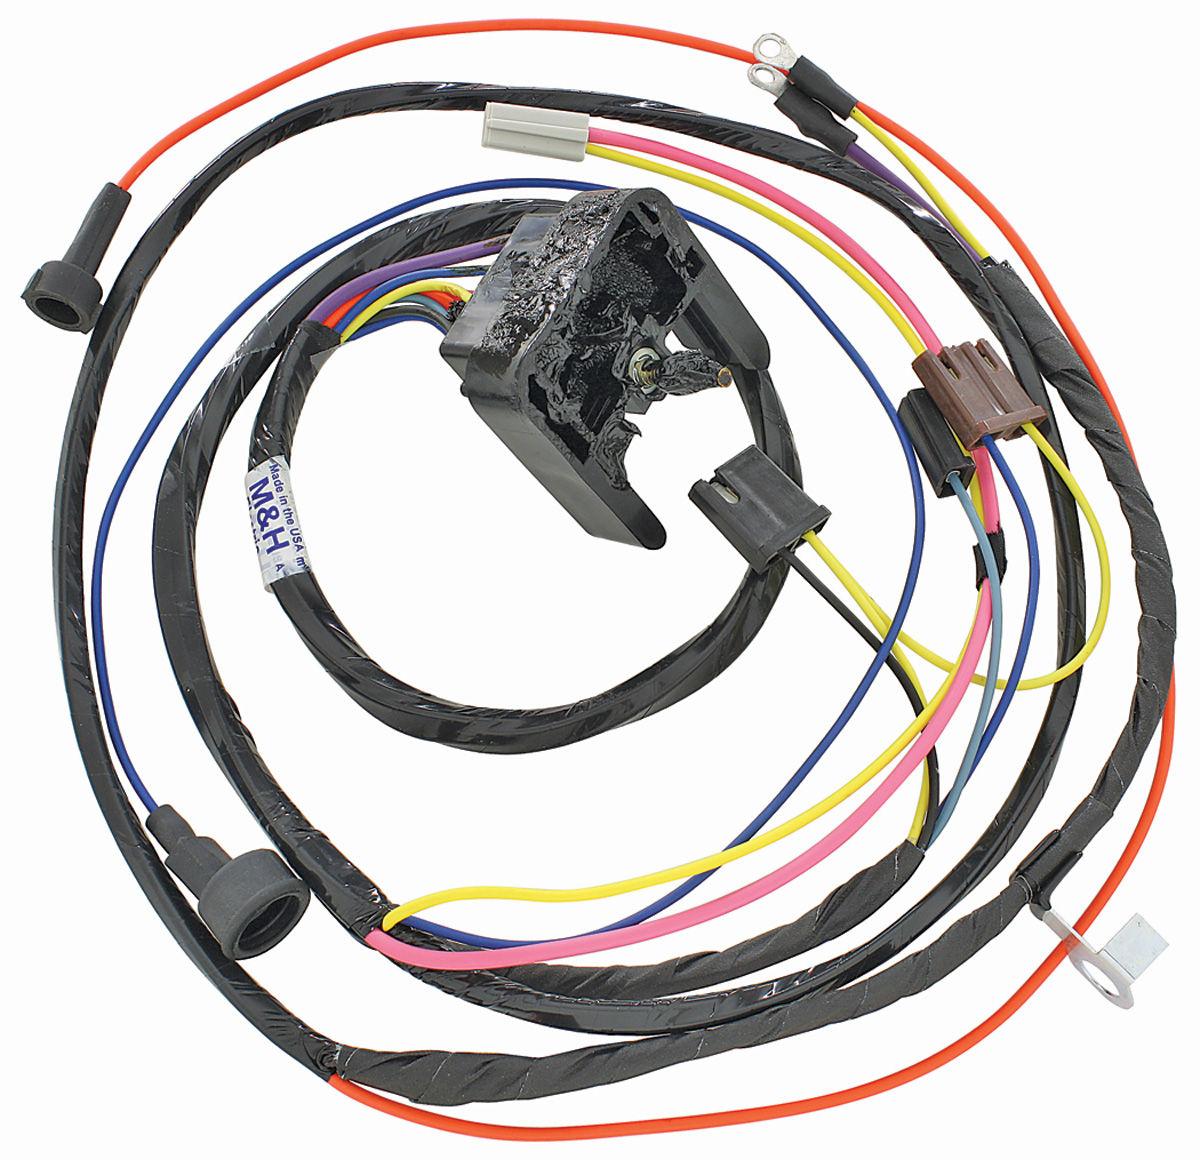 small resolution of original 68 camaro wiring harness complete wiring diagram inside1968 camaro engine wiring diagram schematic 21